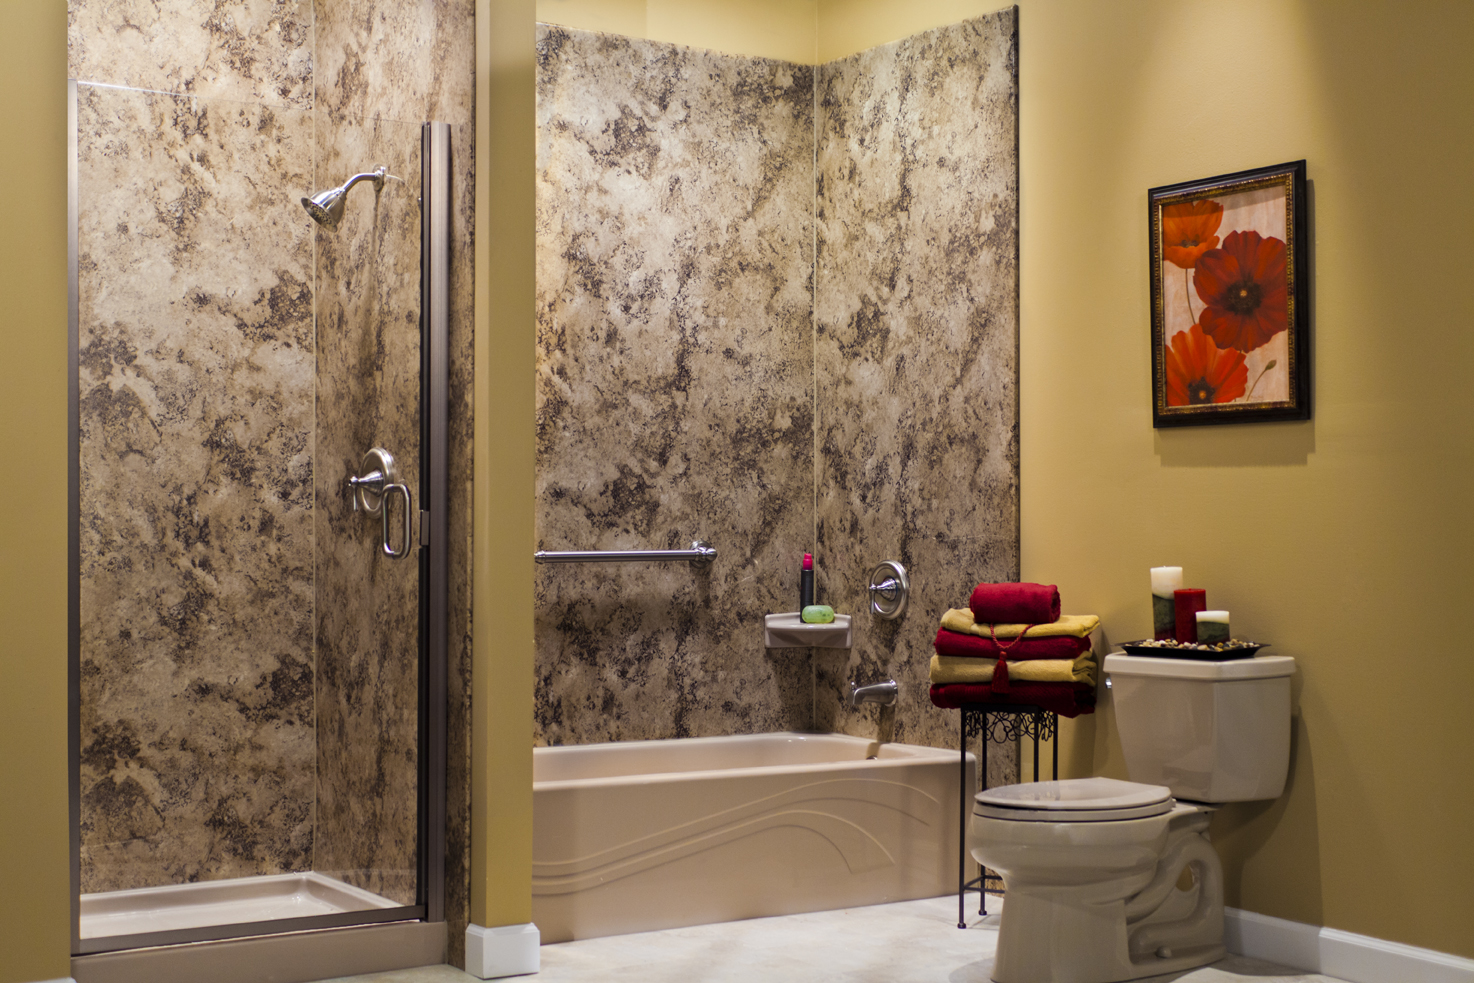 Bathroom Remodel Lansing Mi custom tile bathtub: jacuzzi tub resurfacing custom and tile